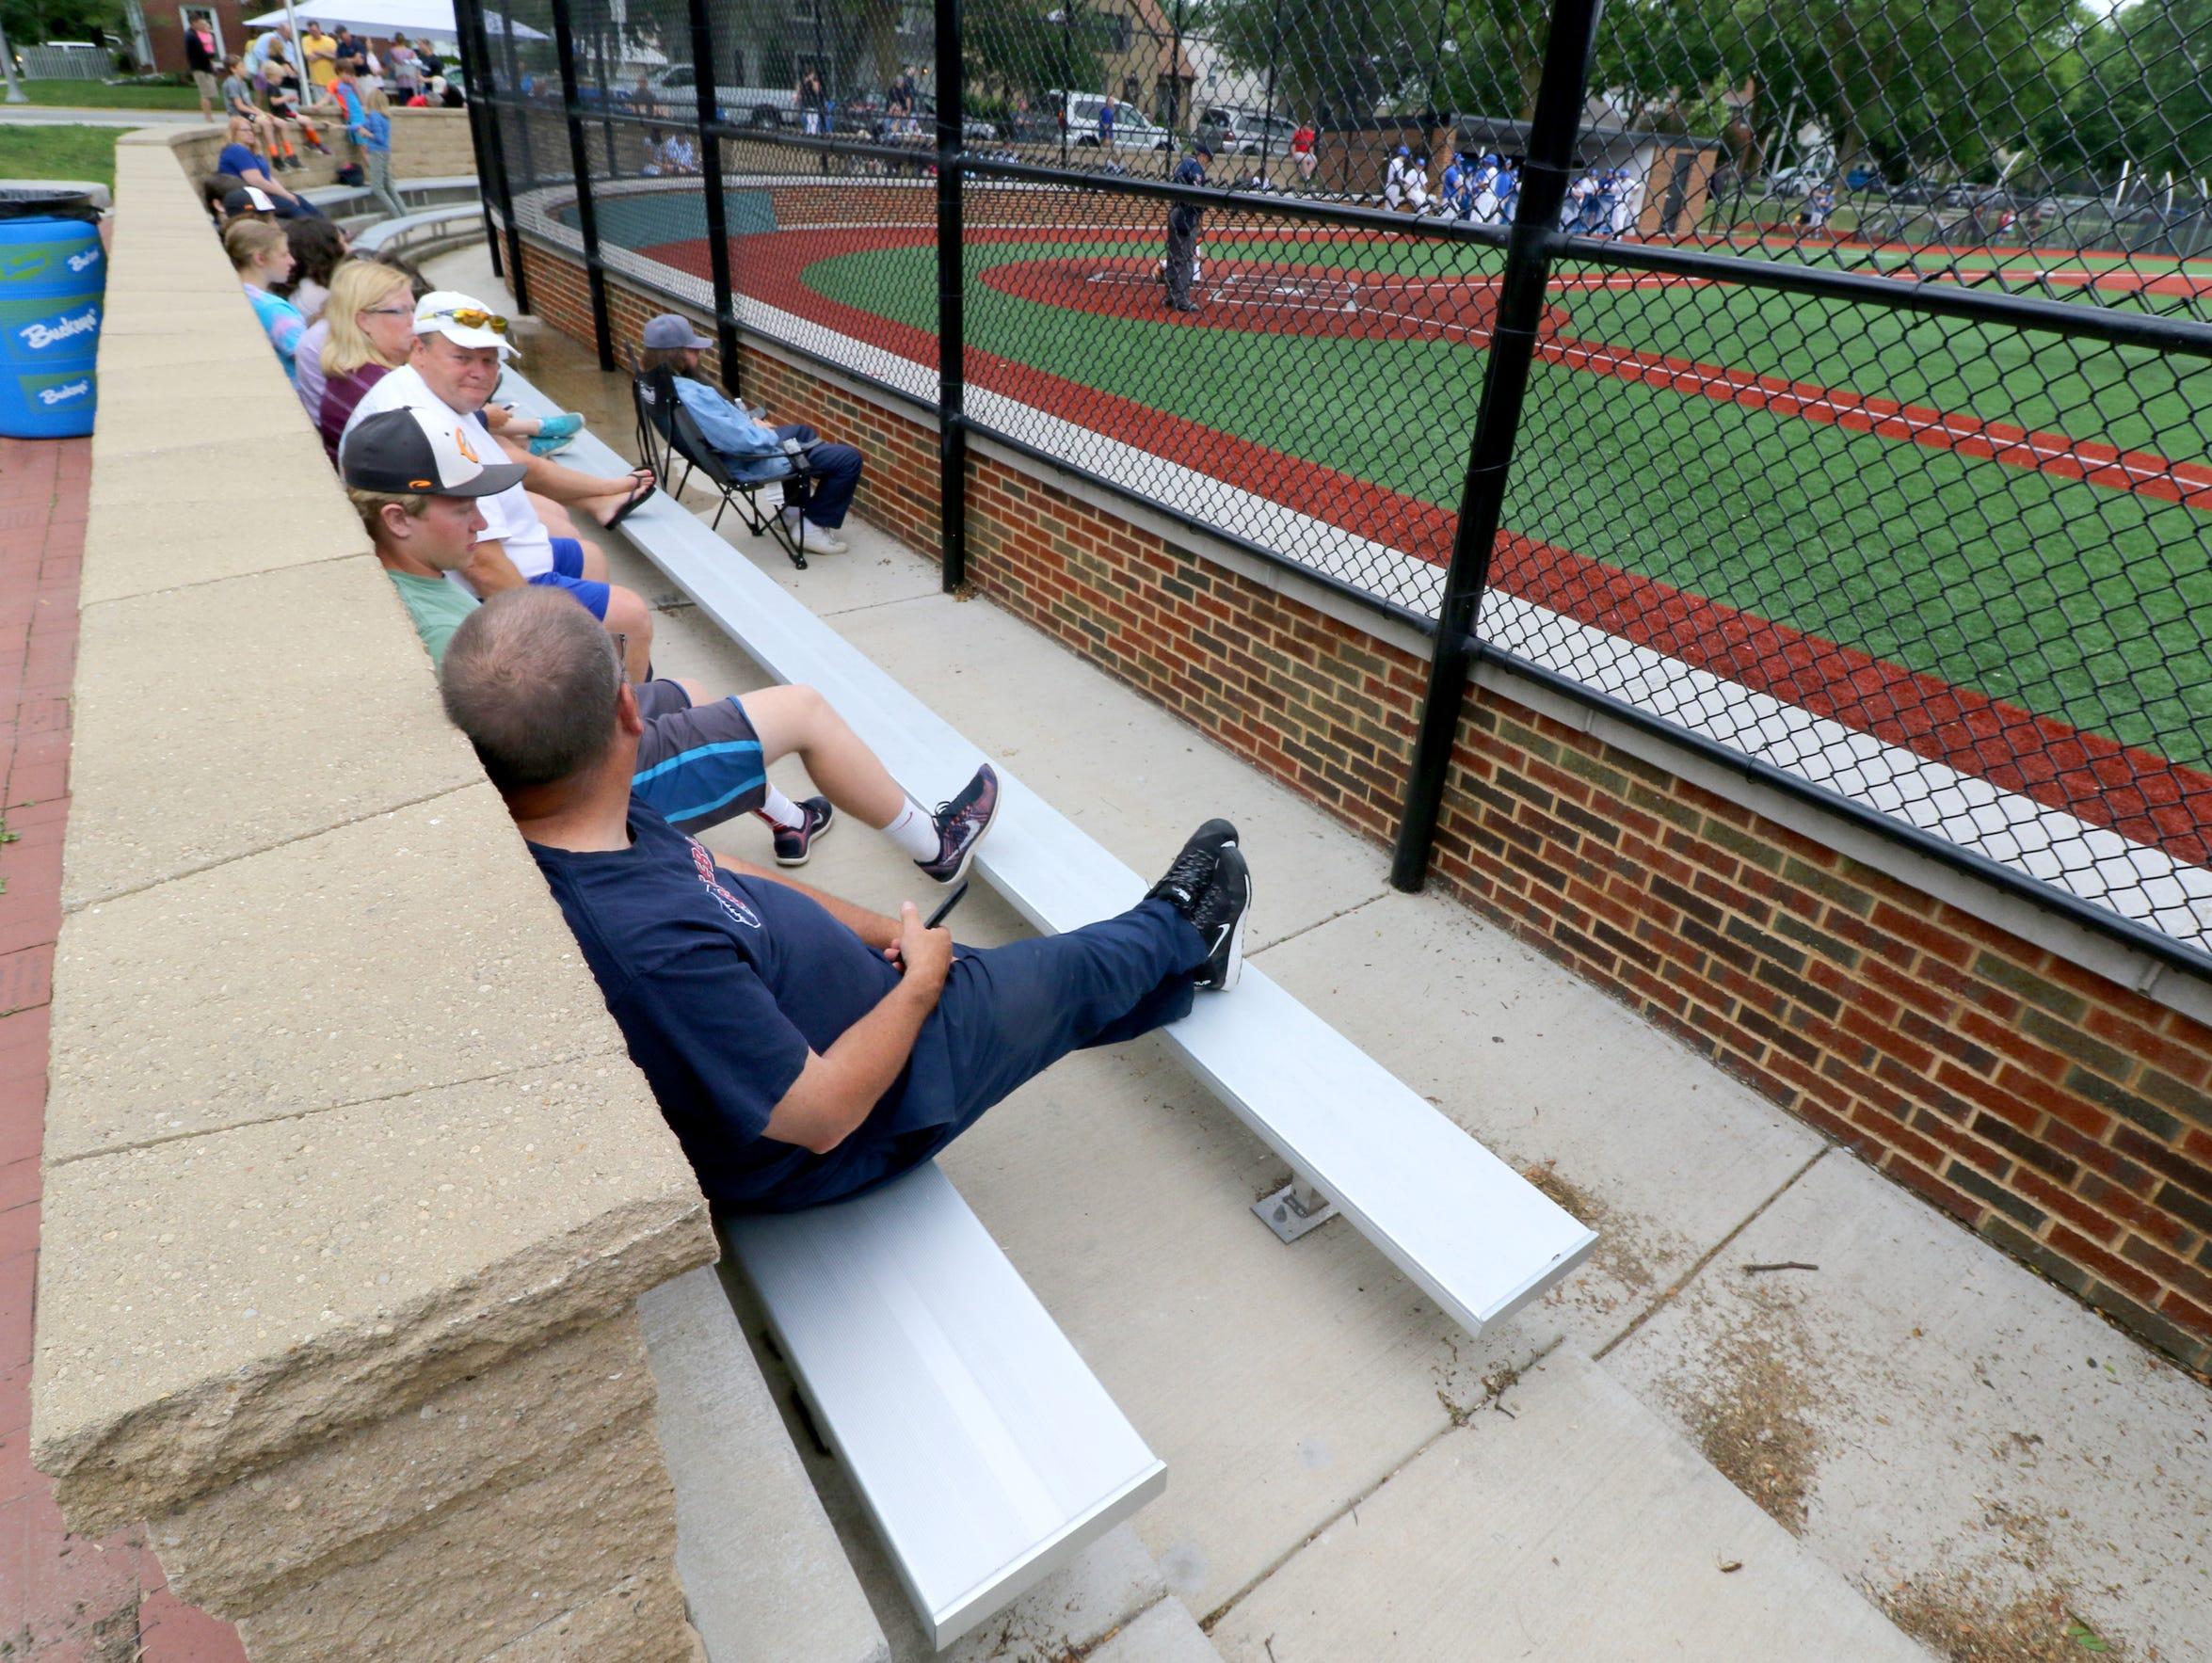 The Cahill Park baseball stadium is depressesed into